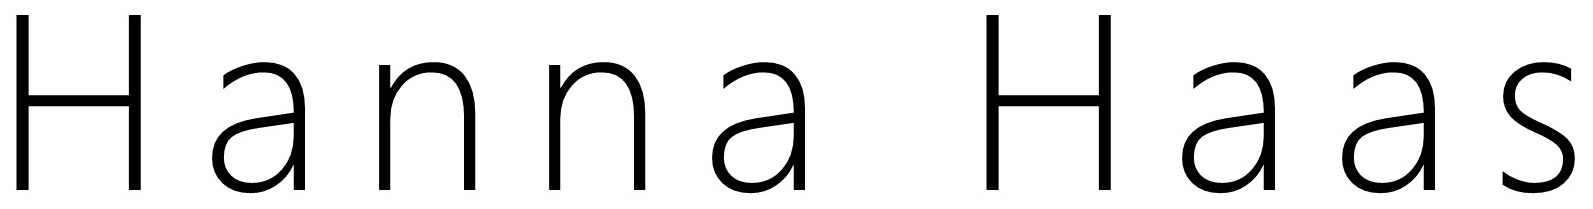 hanna logo.jpg